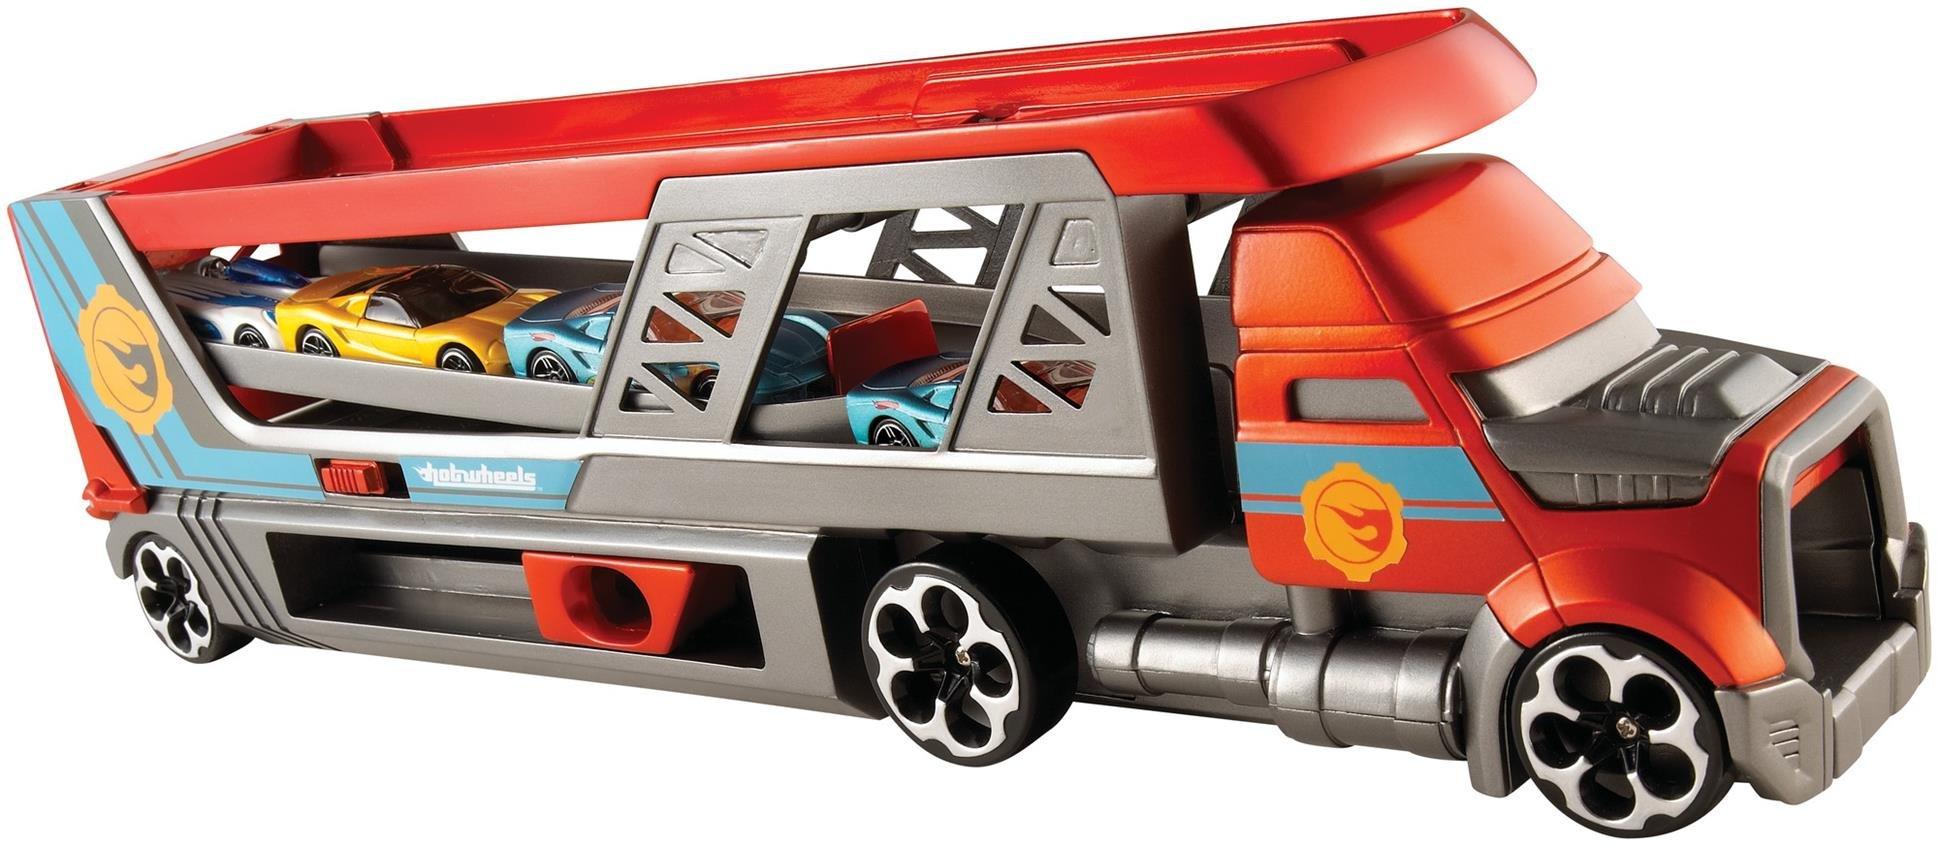 Hot Wheels CDJ19 Mega Hauler Truck, Toy Garage for Diecast Cars [Amazon Exclusive]